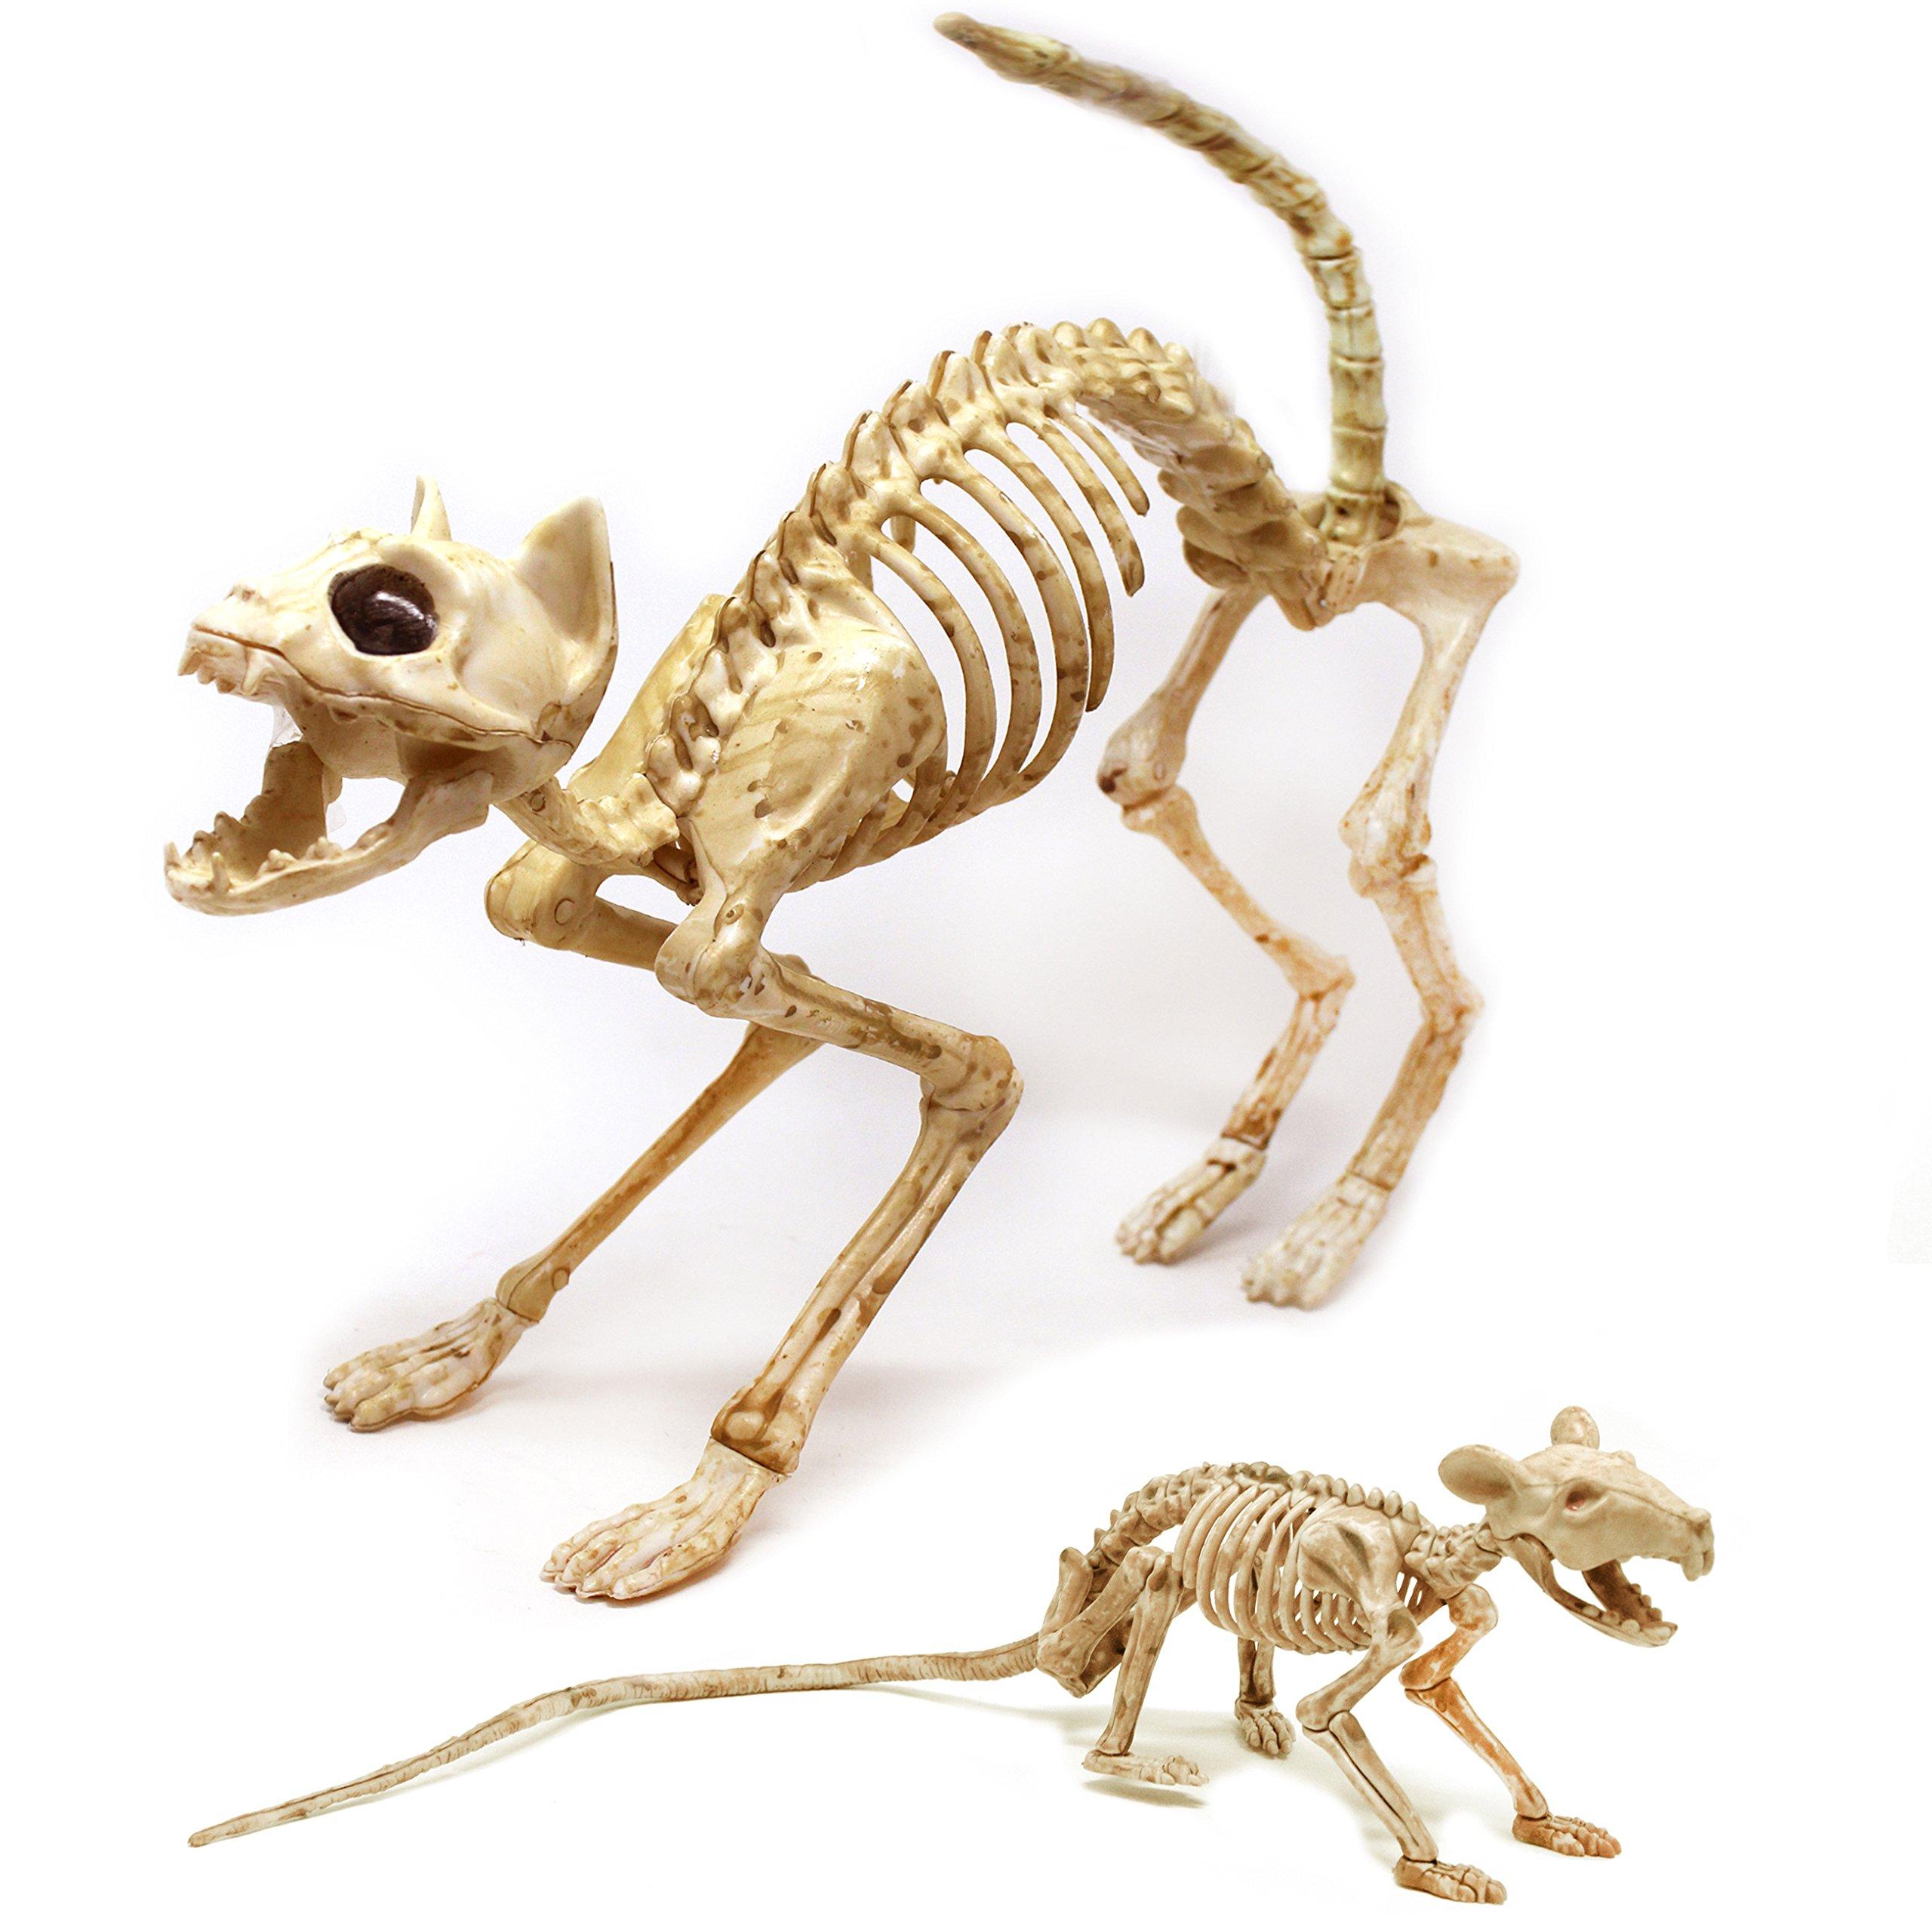 Spooktacular Creations Skeleton Cat & Rat Skeleton for Halloween Skeleton Animal Decorations, Skeleton Yard Décor and Reaper Bones Animals